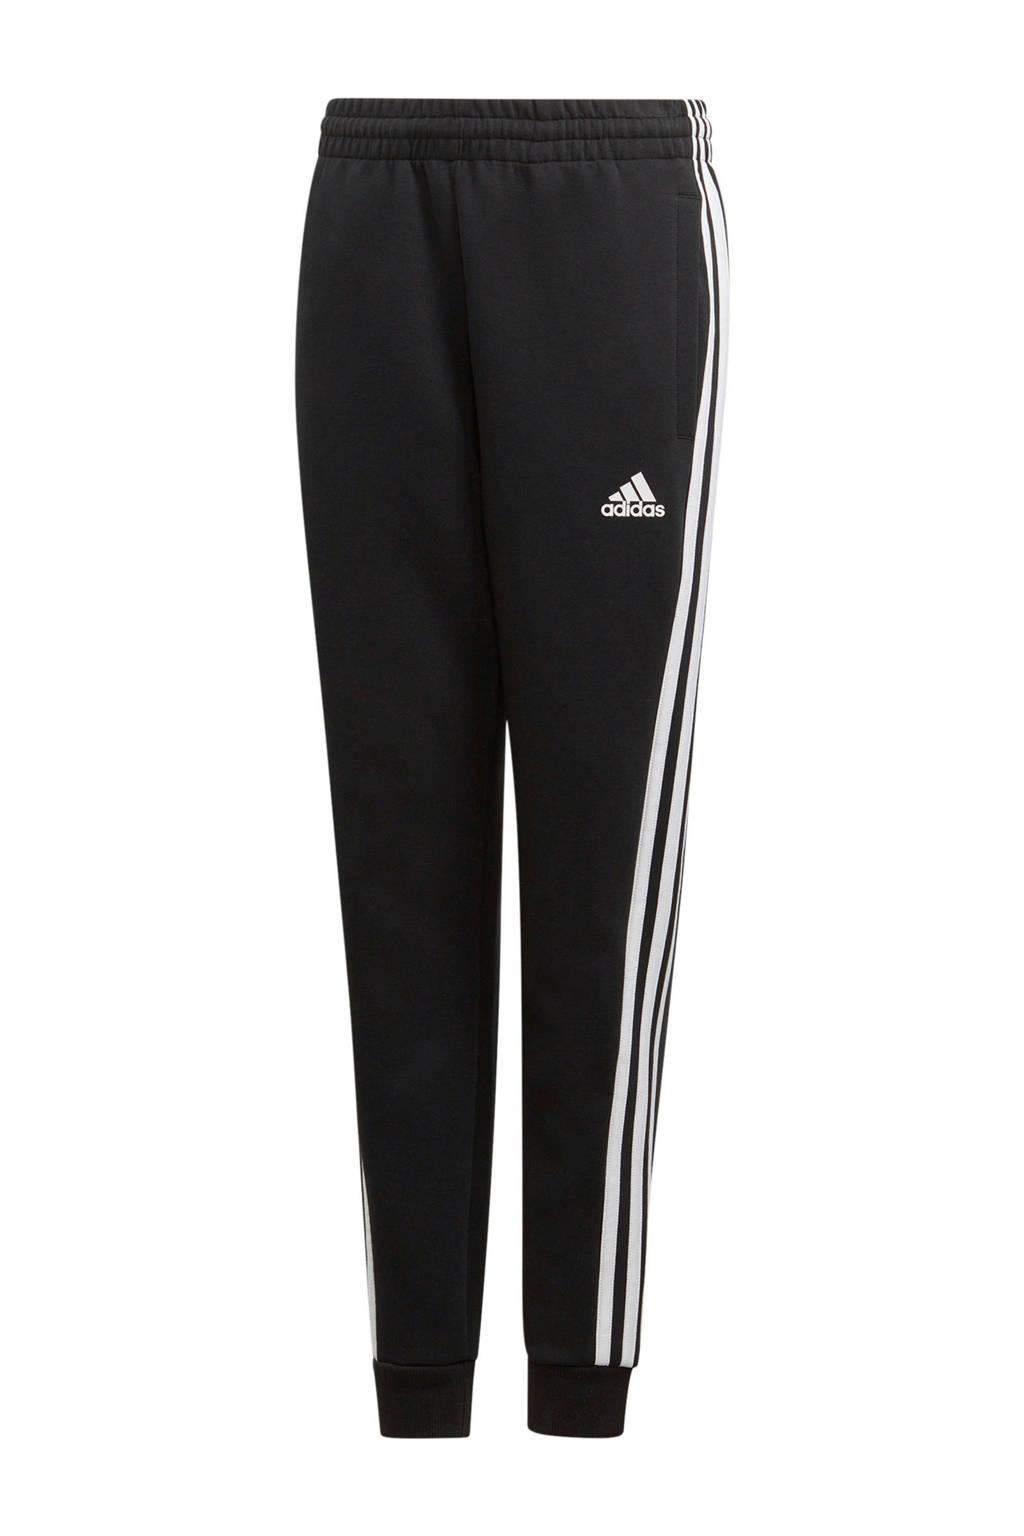 adidas   regular fit joggingbroek zwart/wit, Zwart/wit